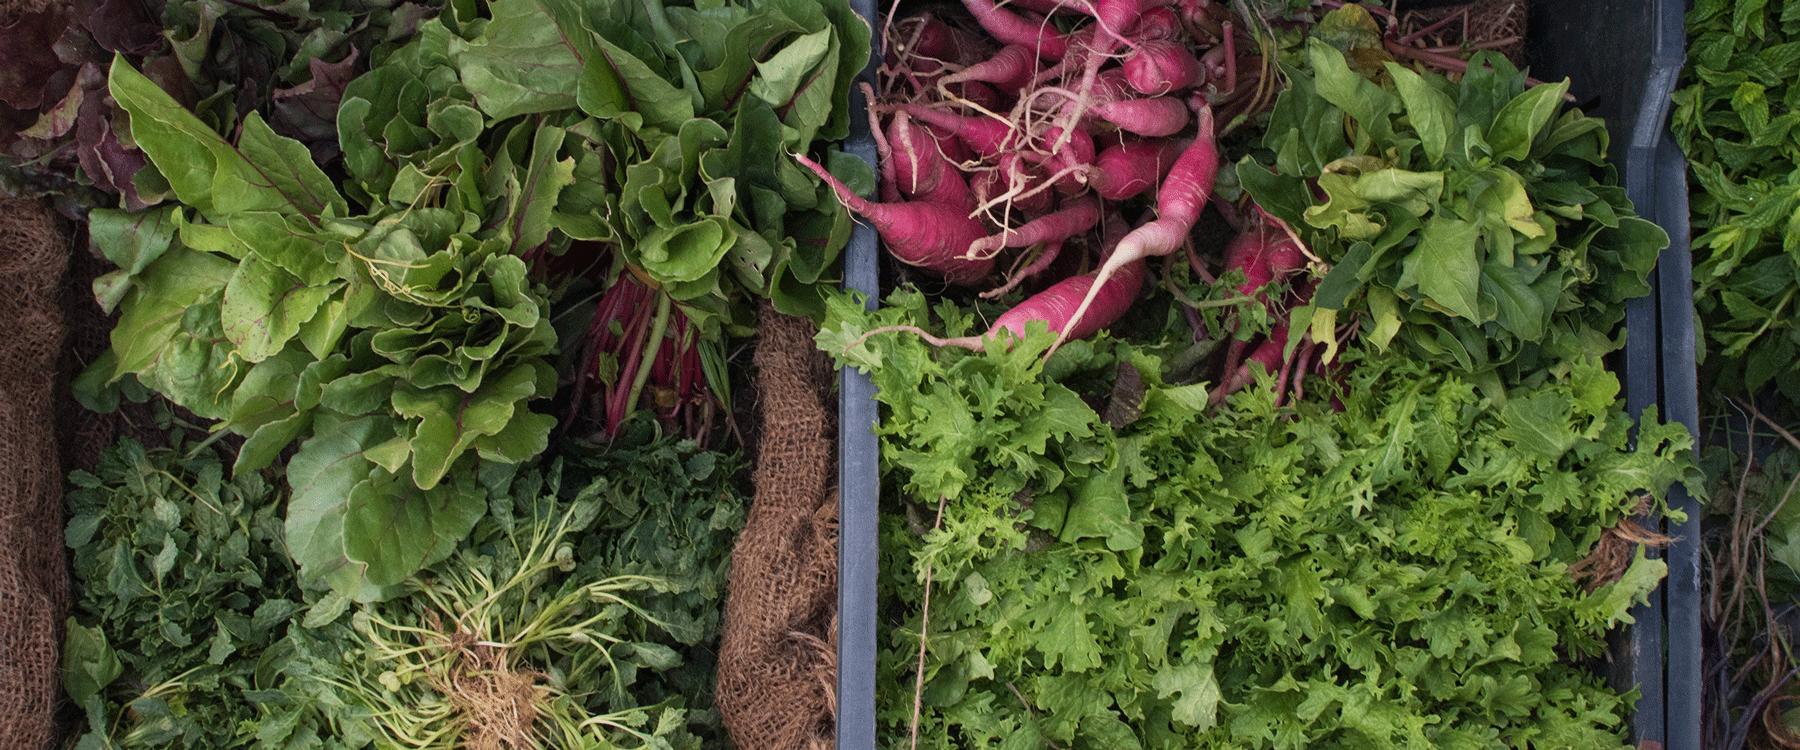 FARM TO TABLE PHILOSOPHY - Eat seasonally, eat locally, live sustainable at Drayton Ridge.